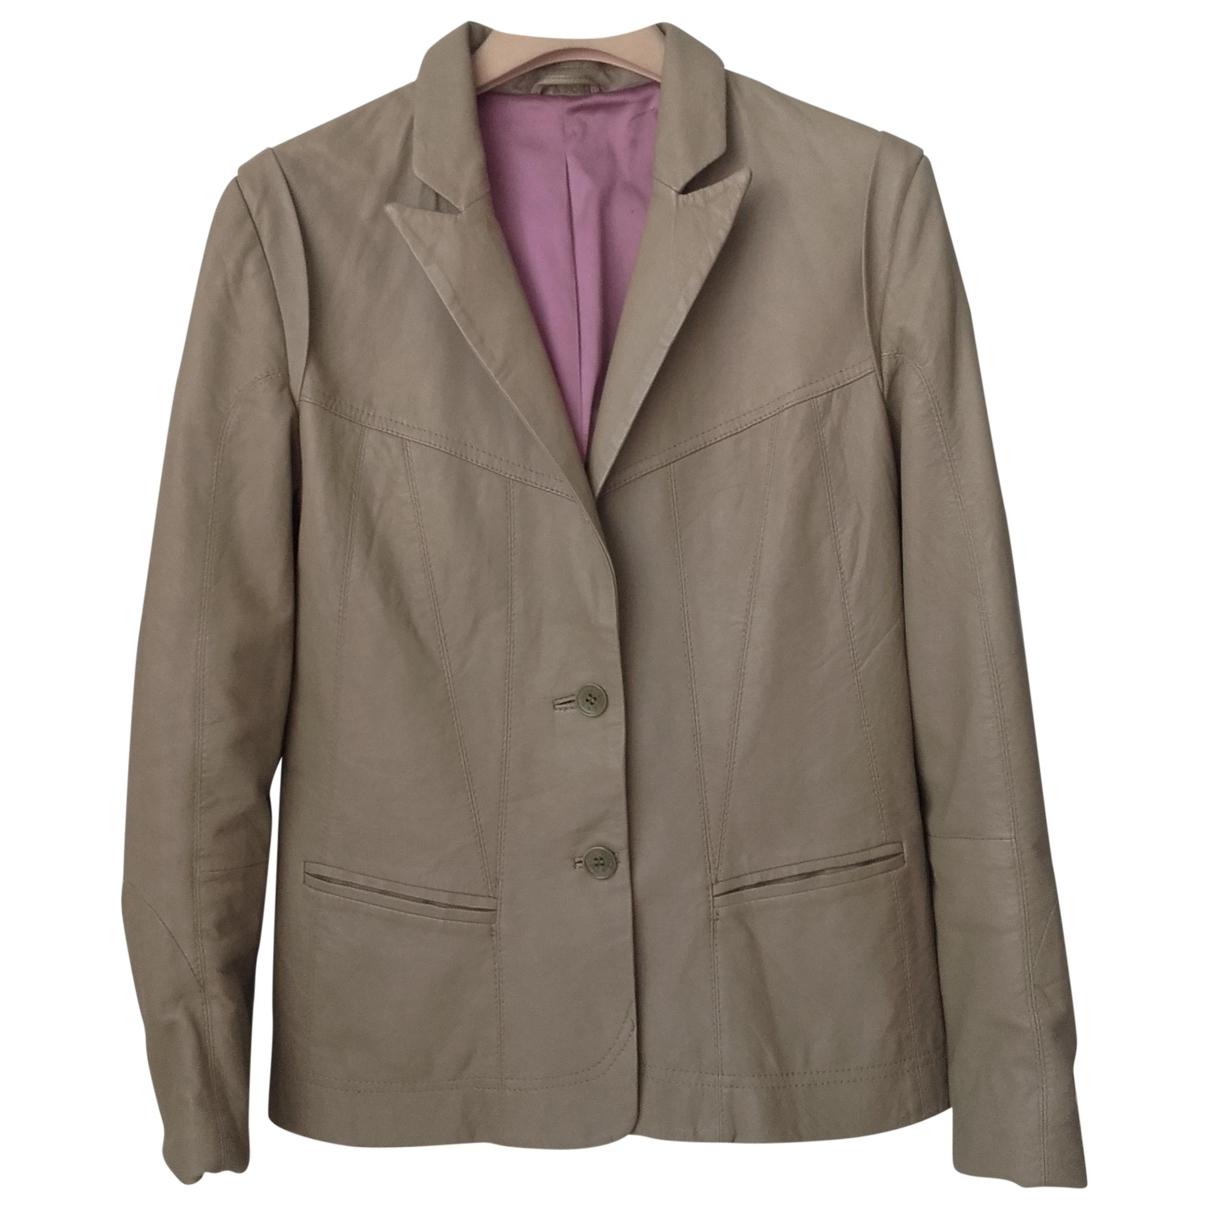 Zadig & Voltaire \N Beige Leather jacket for Women M International